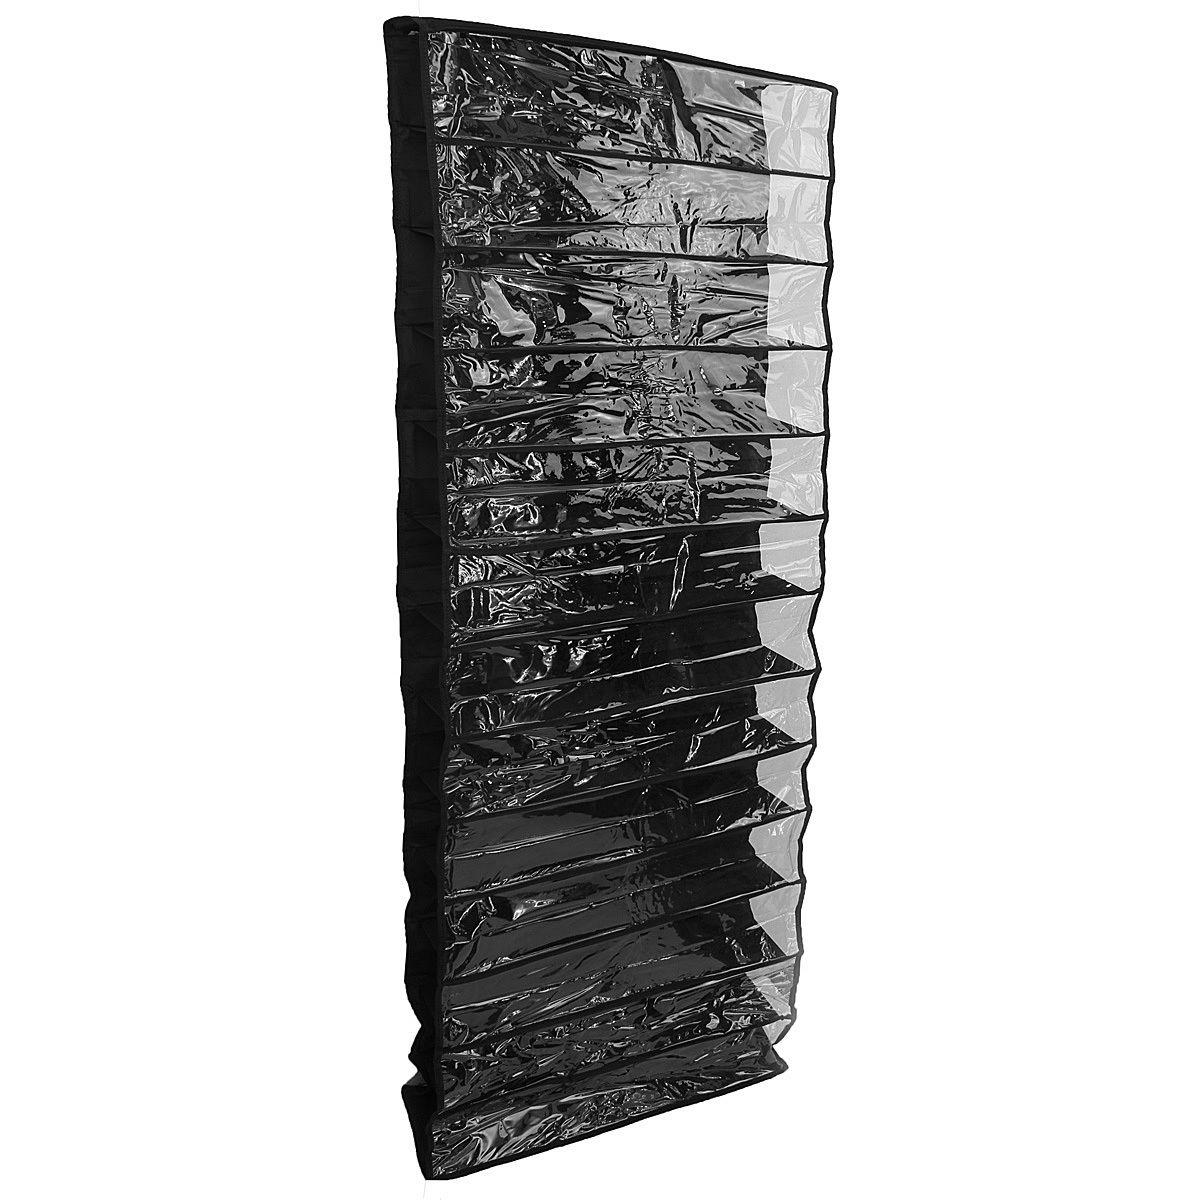 SZS Hot 26 Pairs Over Door Hanging Stand Shoe Rack Shelf Storage Organiser Pocket Holder black  цена и фото